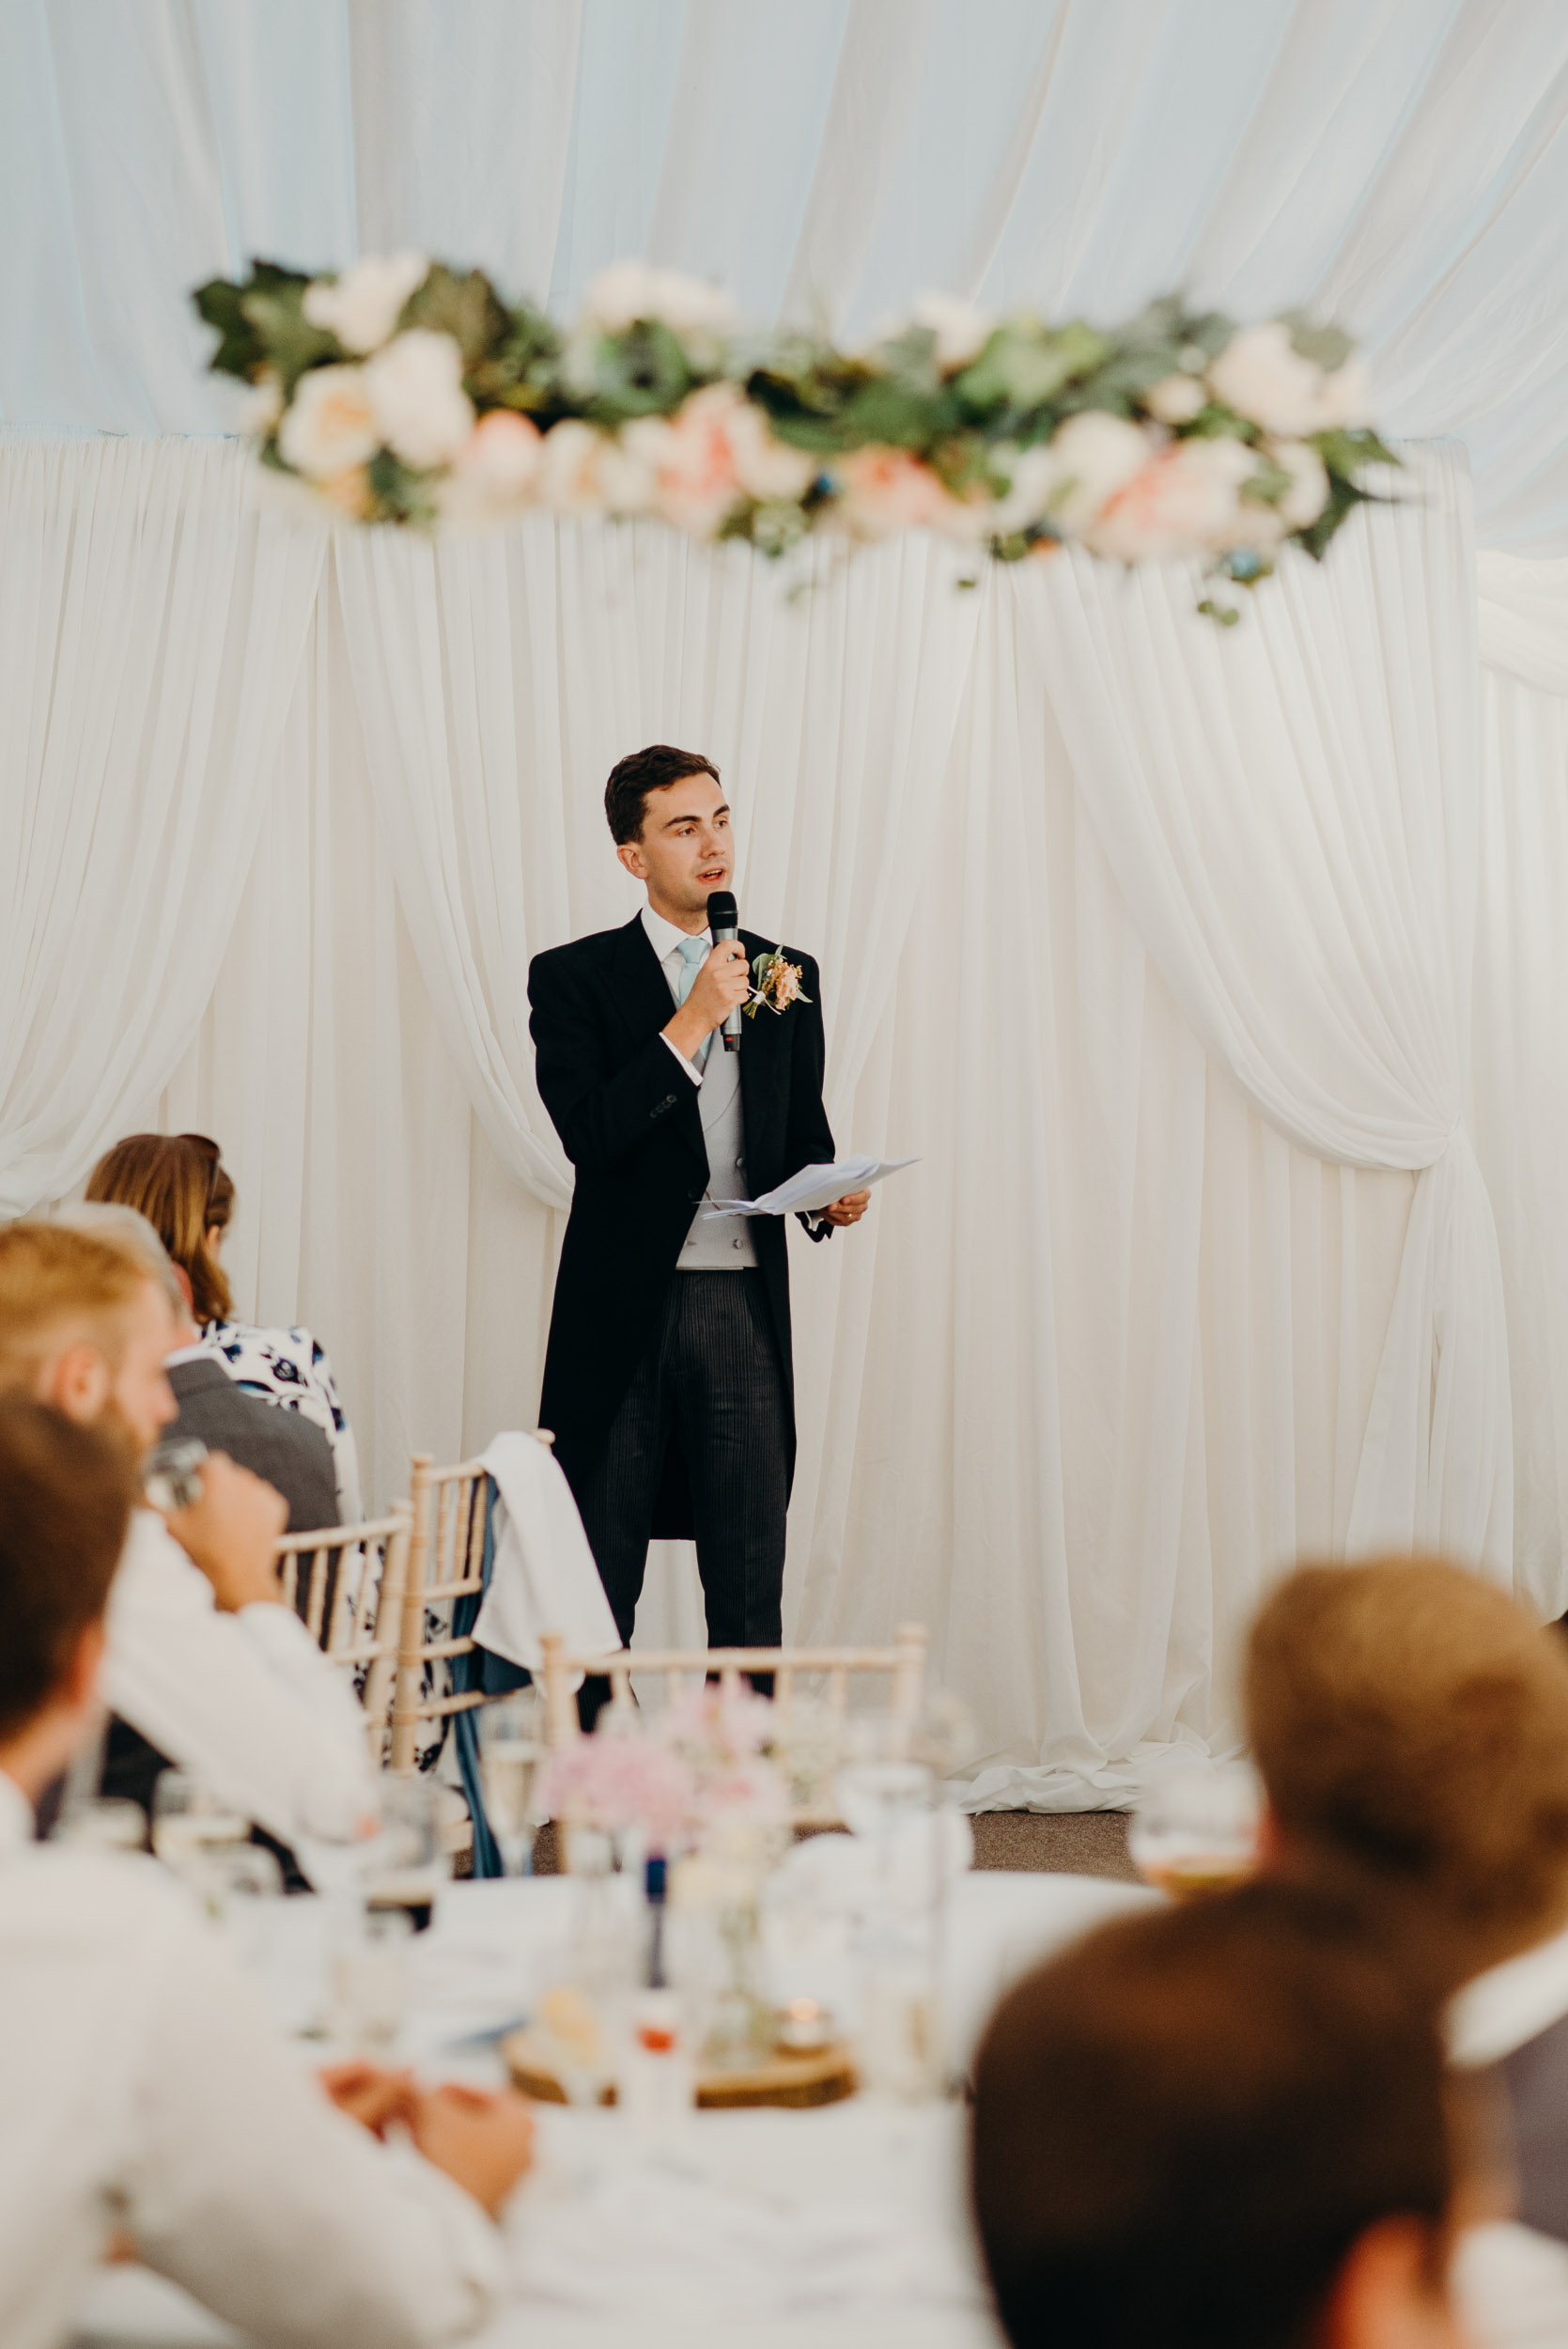 drenagh estate wedding photography-111.jpg